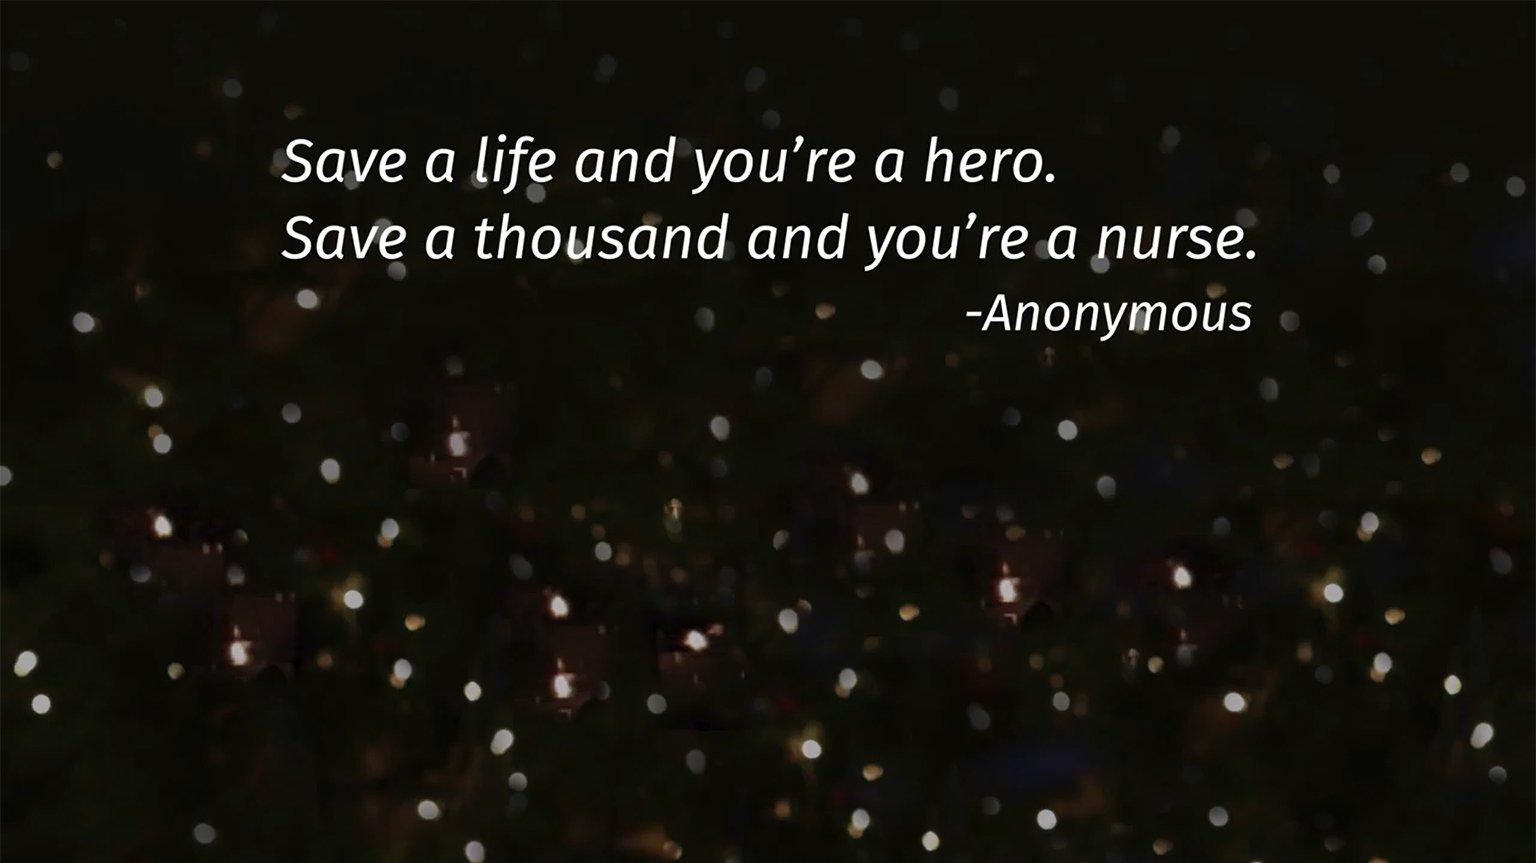 Screenshot from Lippincott Nursing Education sizzle video